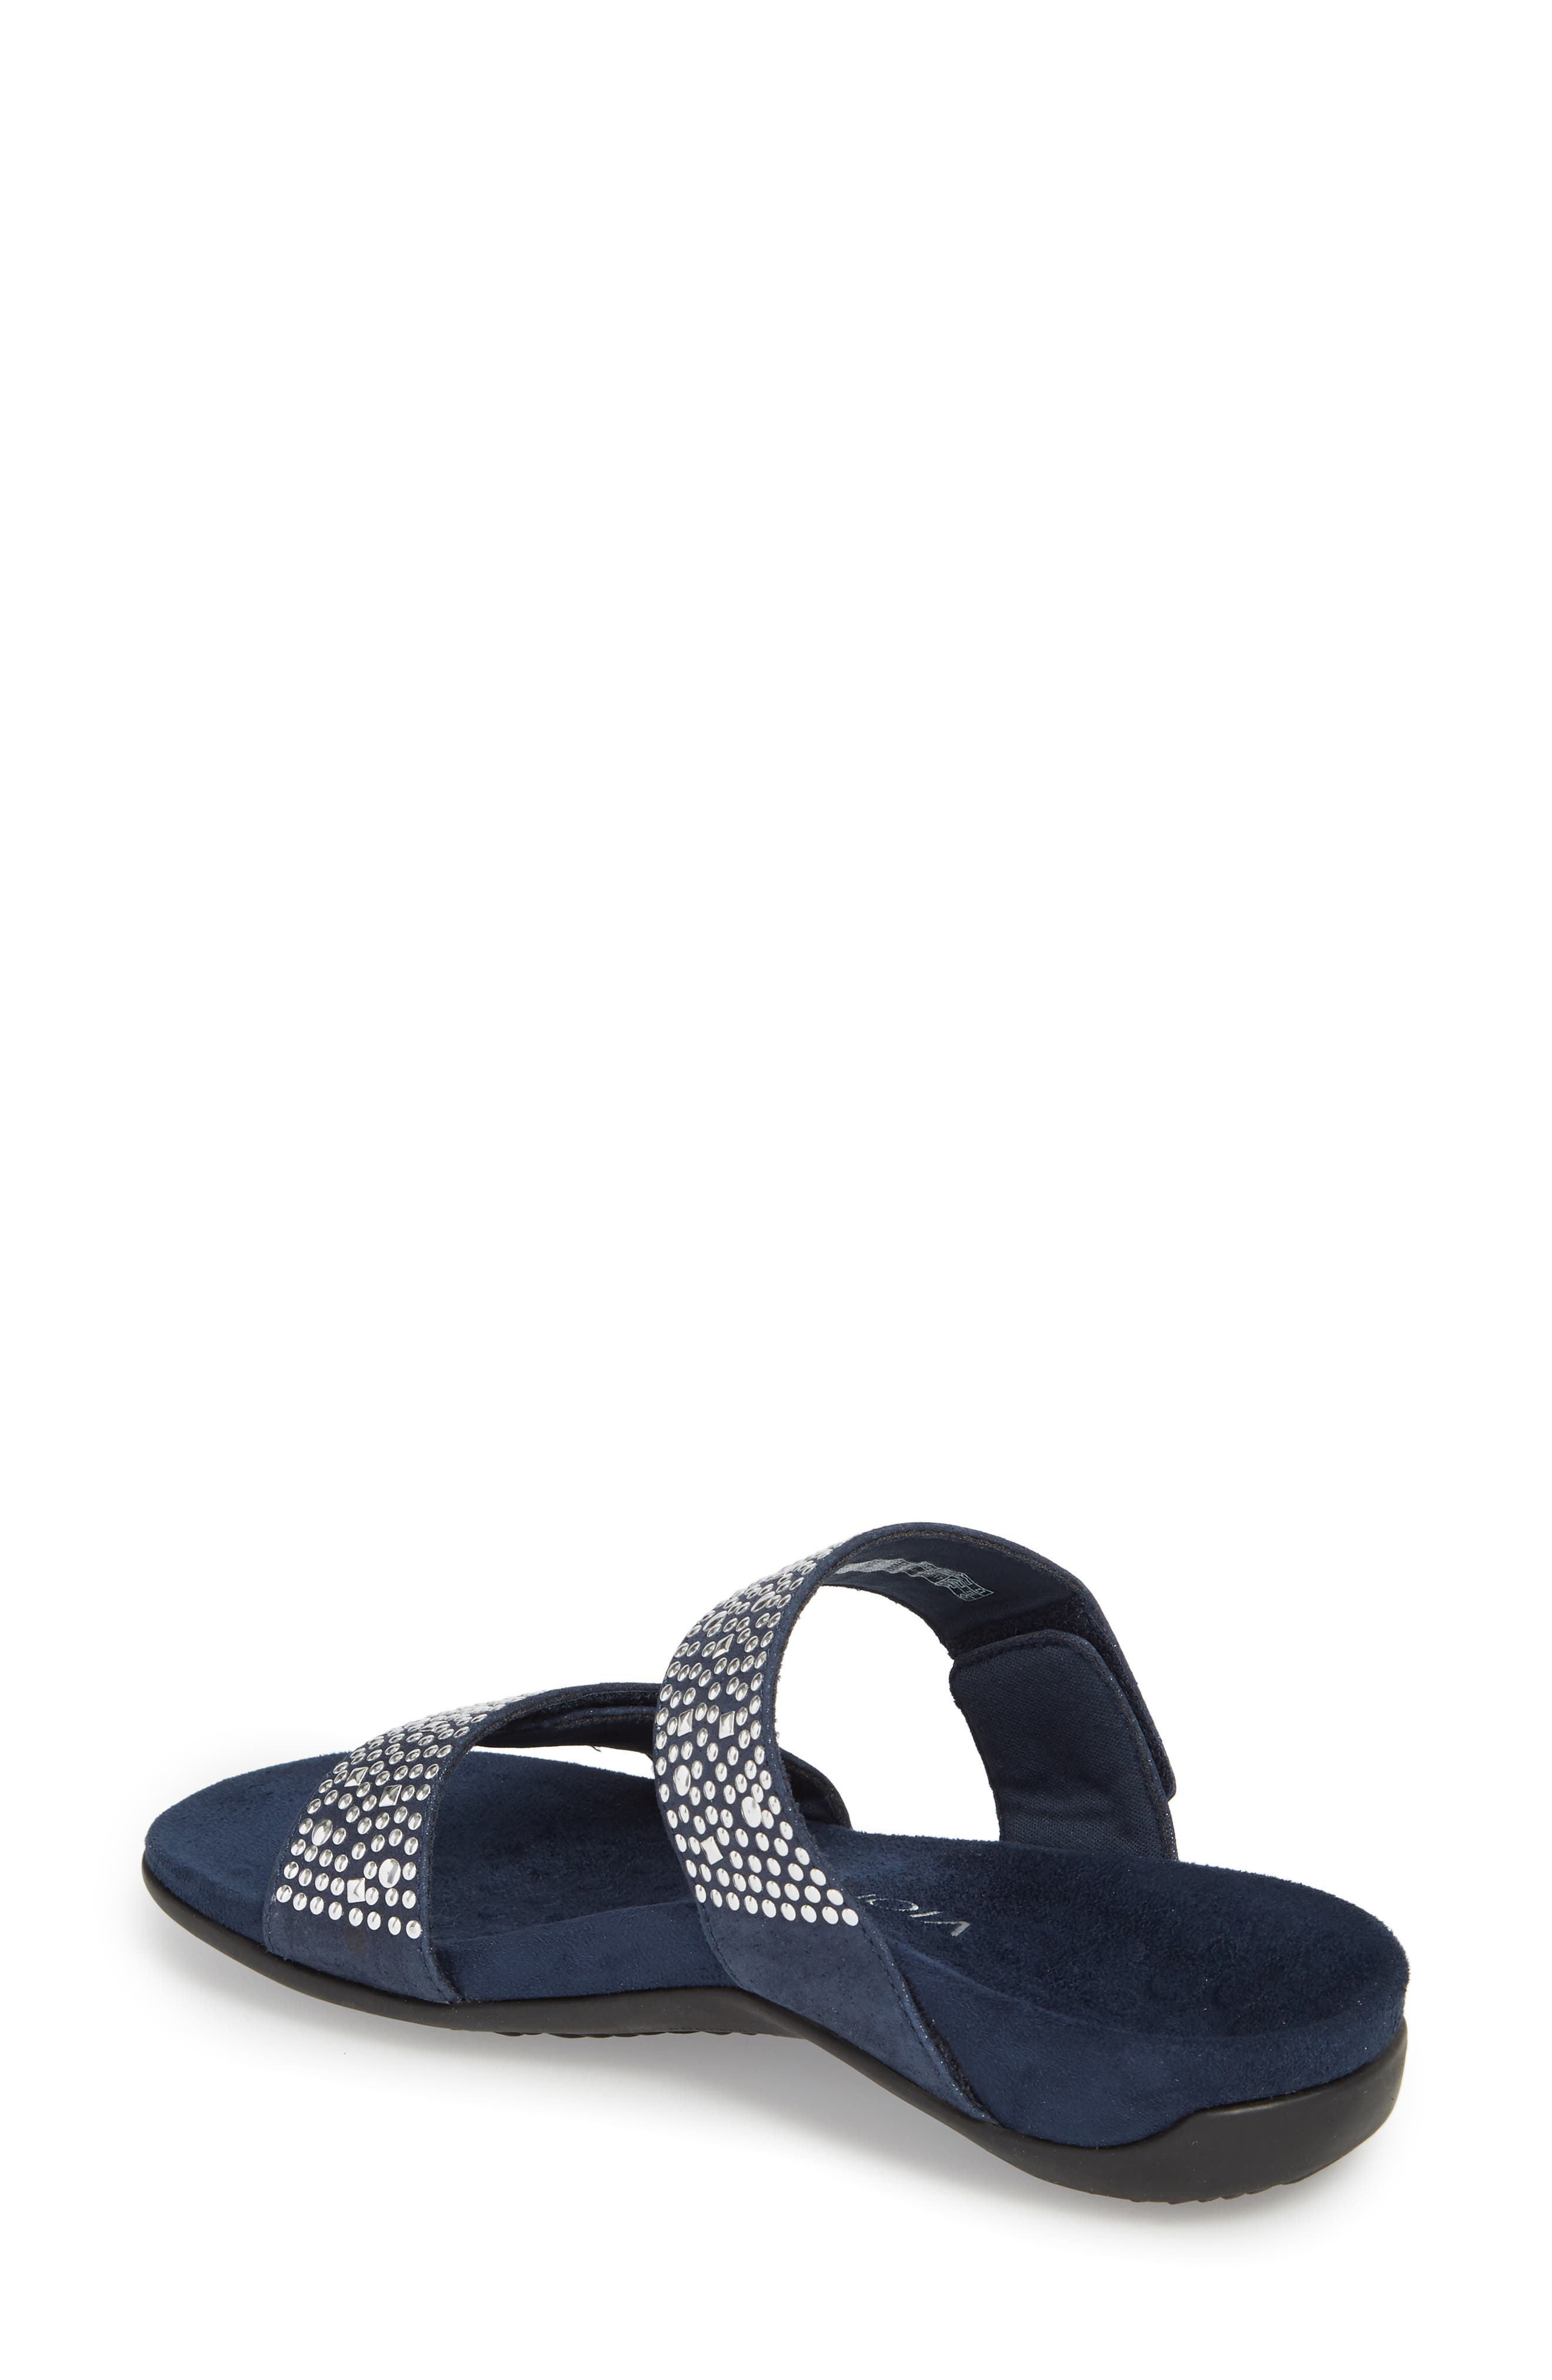 'Samoa' Sandal,                             Alternate thumbnail 2, color,                             Navy Suede